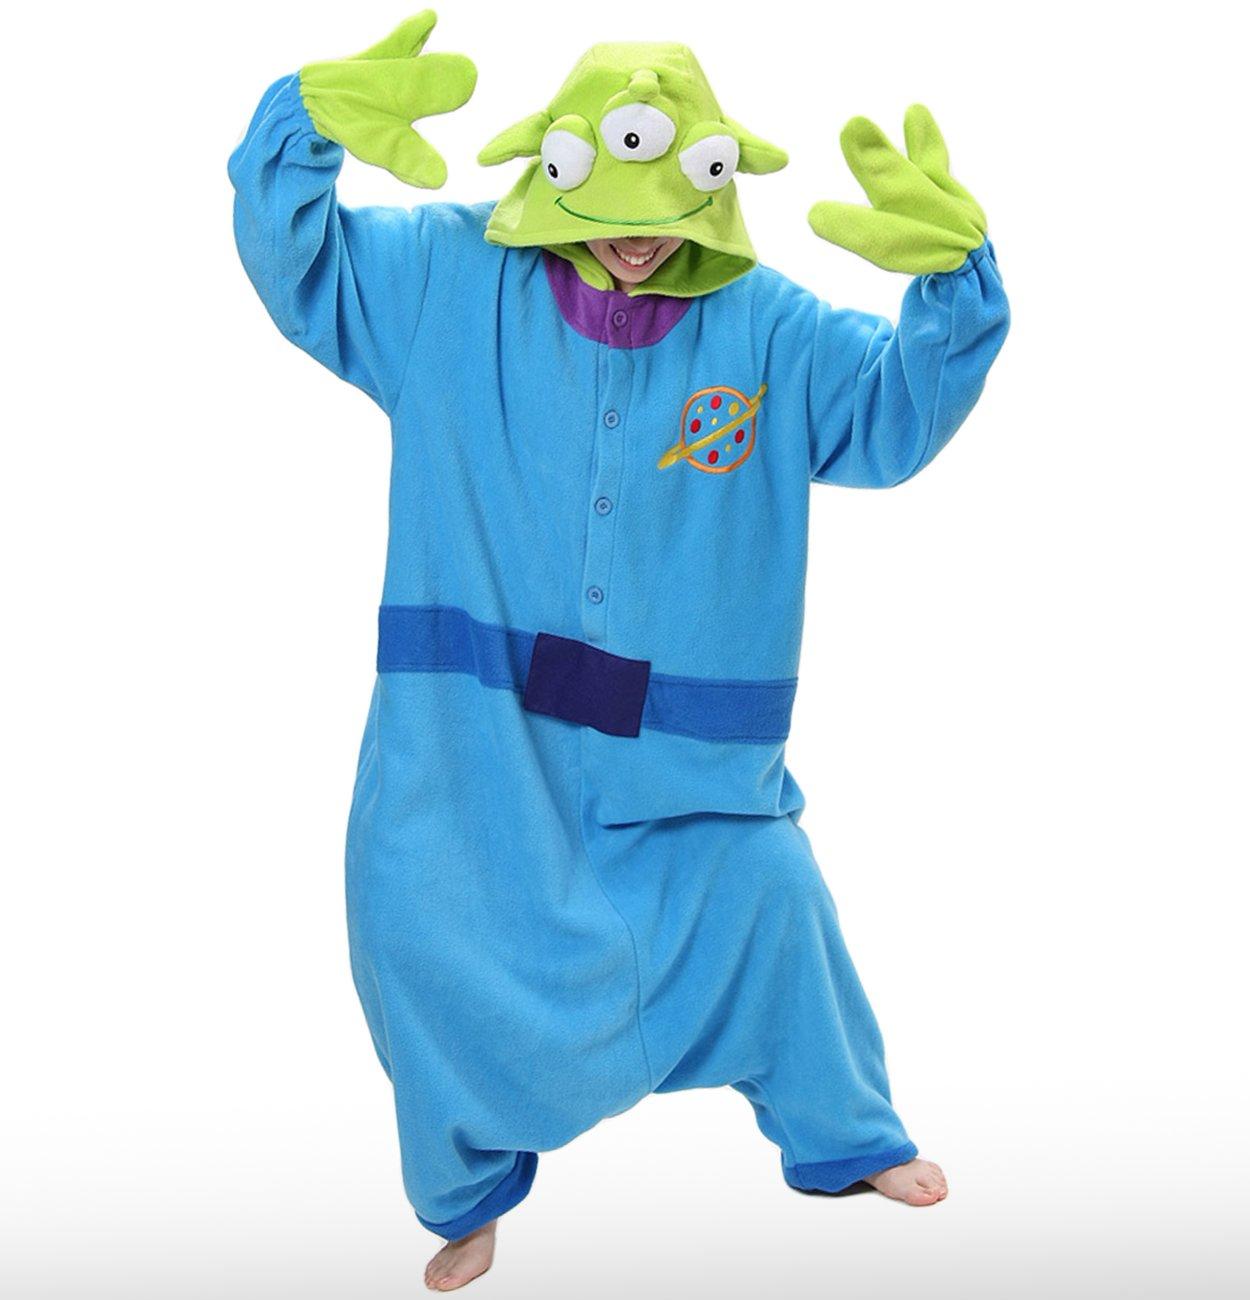 Toy Story Alien Adult Kigu Costume